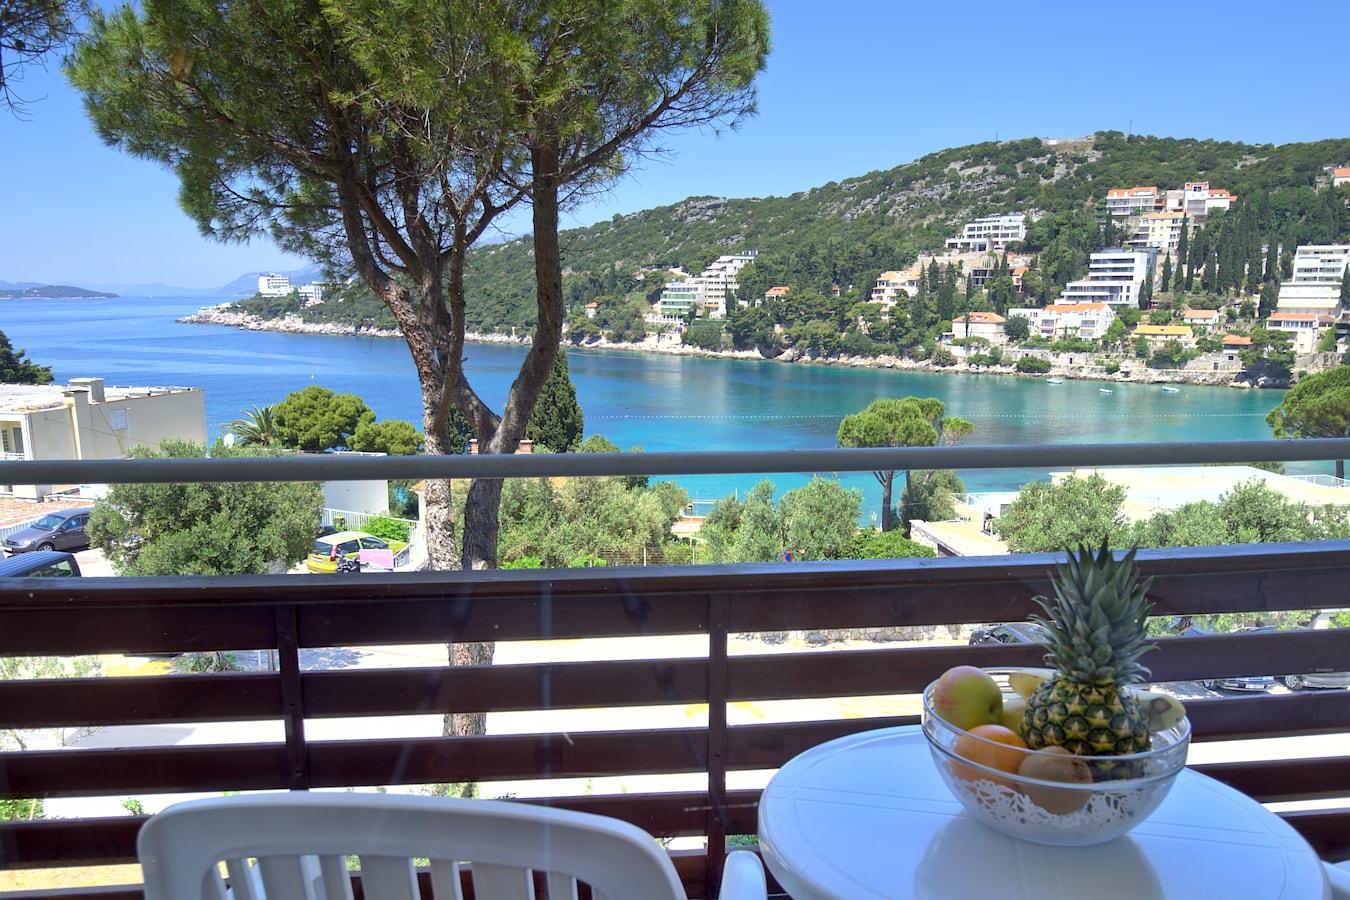 adriatic-hotel-rooms-seaview.jpg